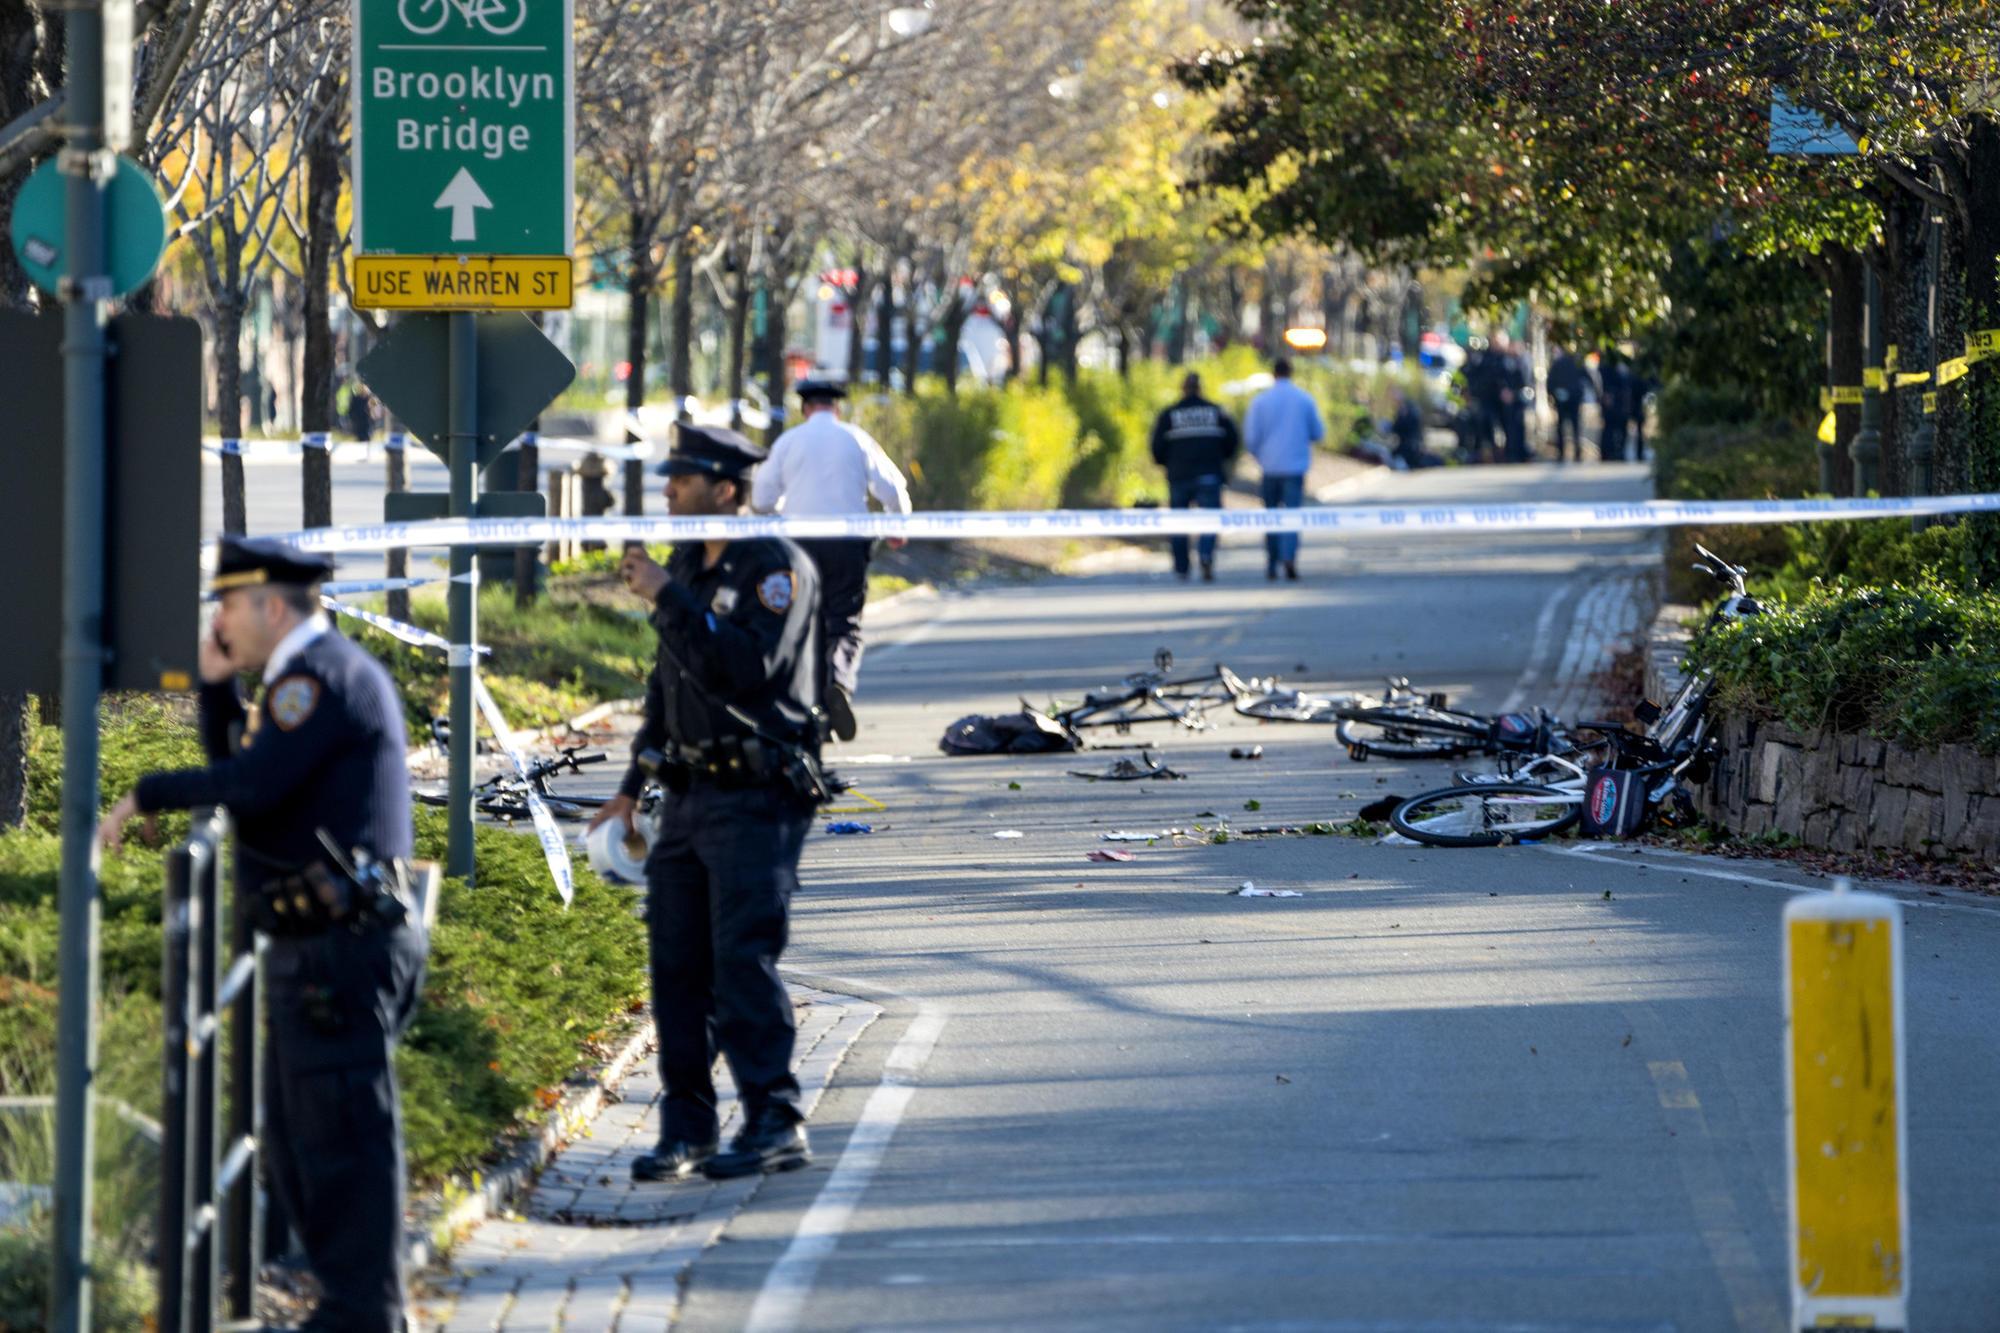 Pickup strikes bicyclists in Lower Manhattan